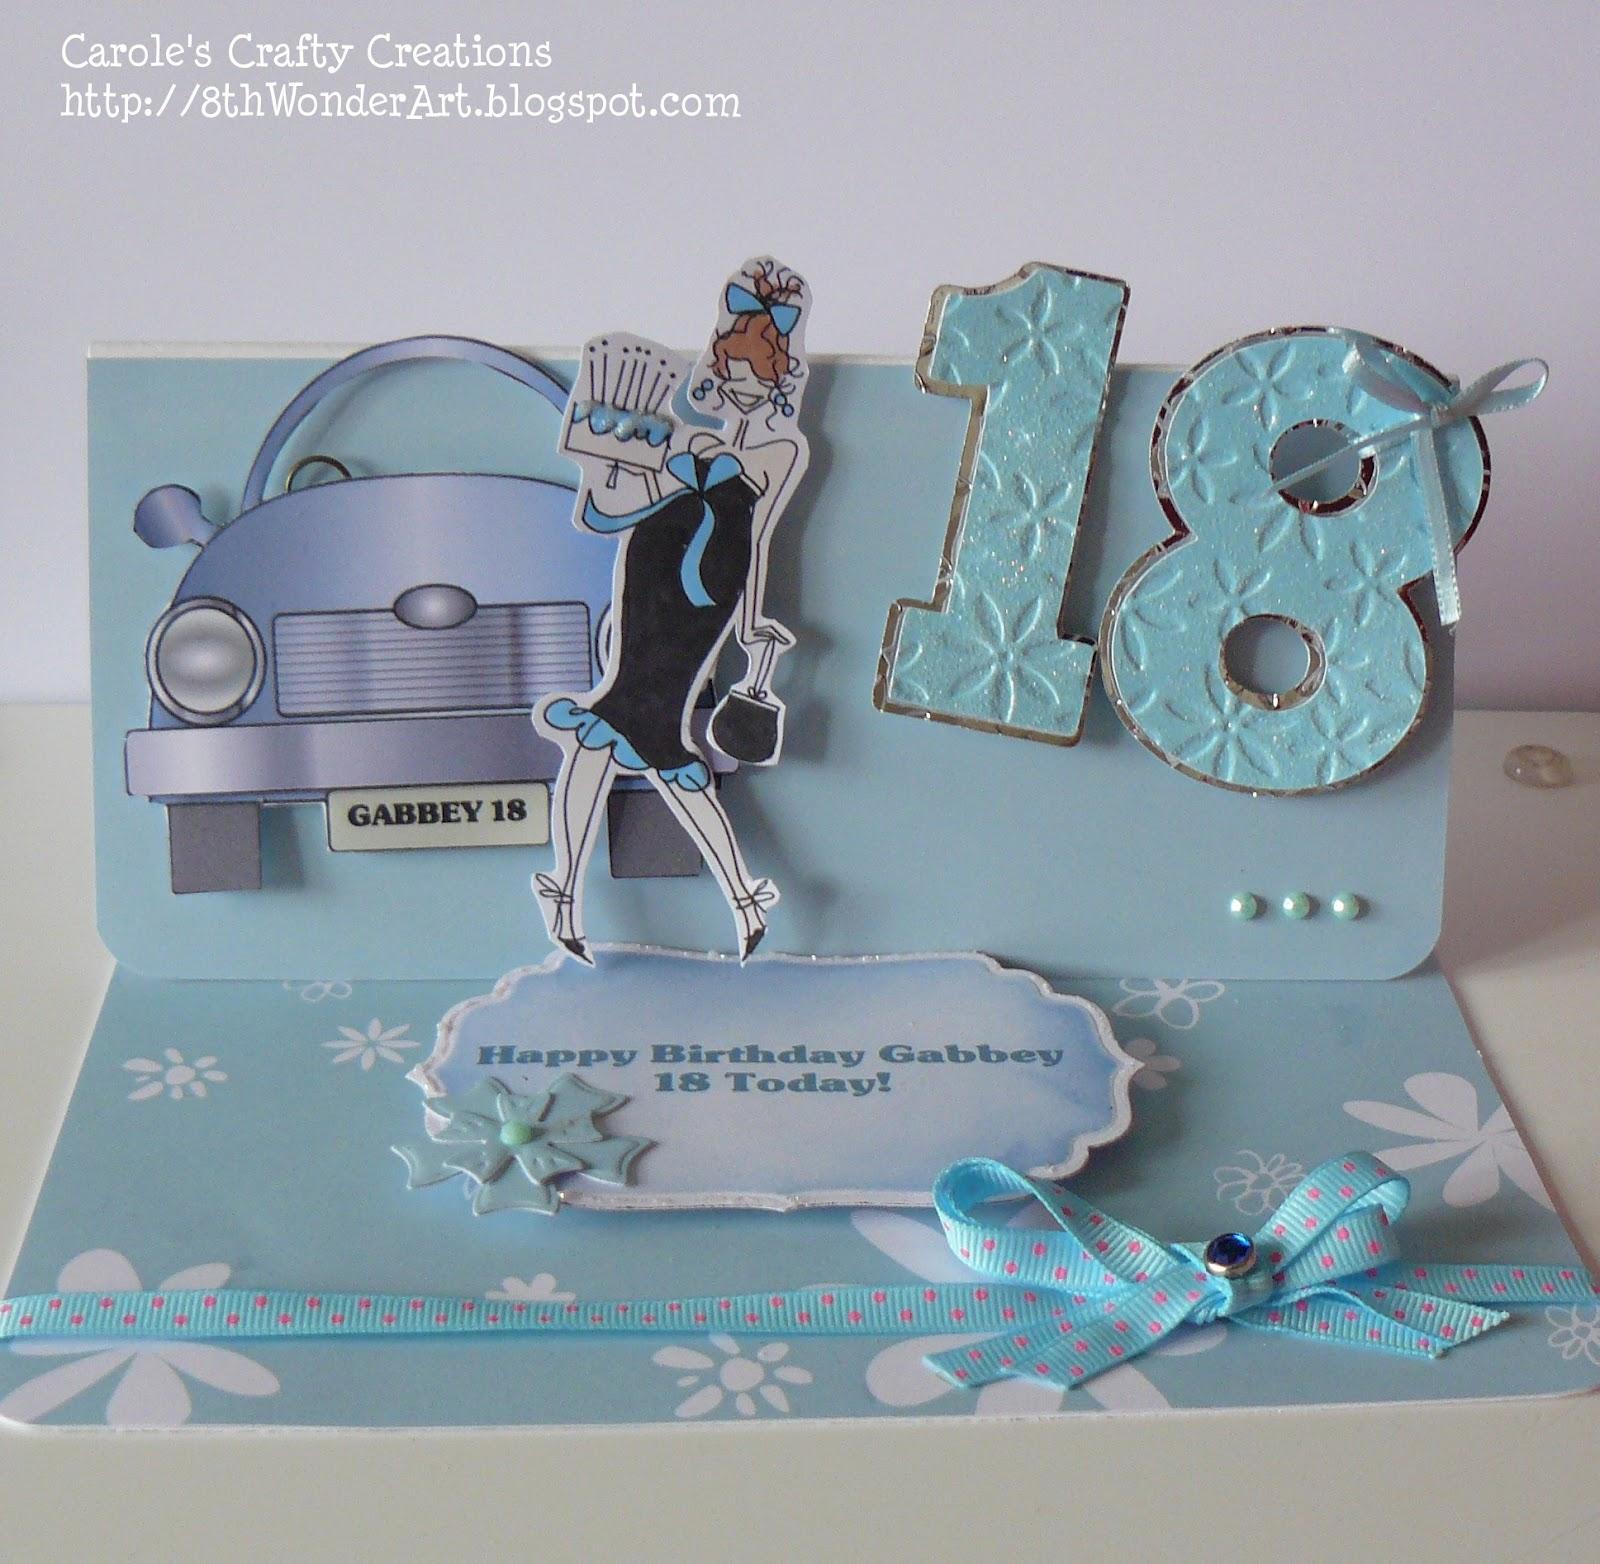 Caroles Crafty Creations: 18th Birthday Easel Card - 6th March